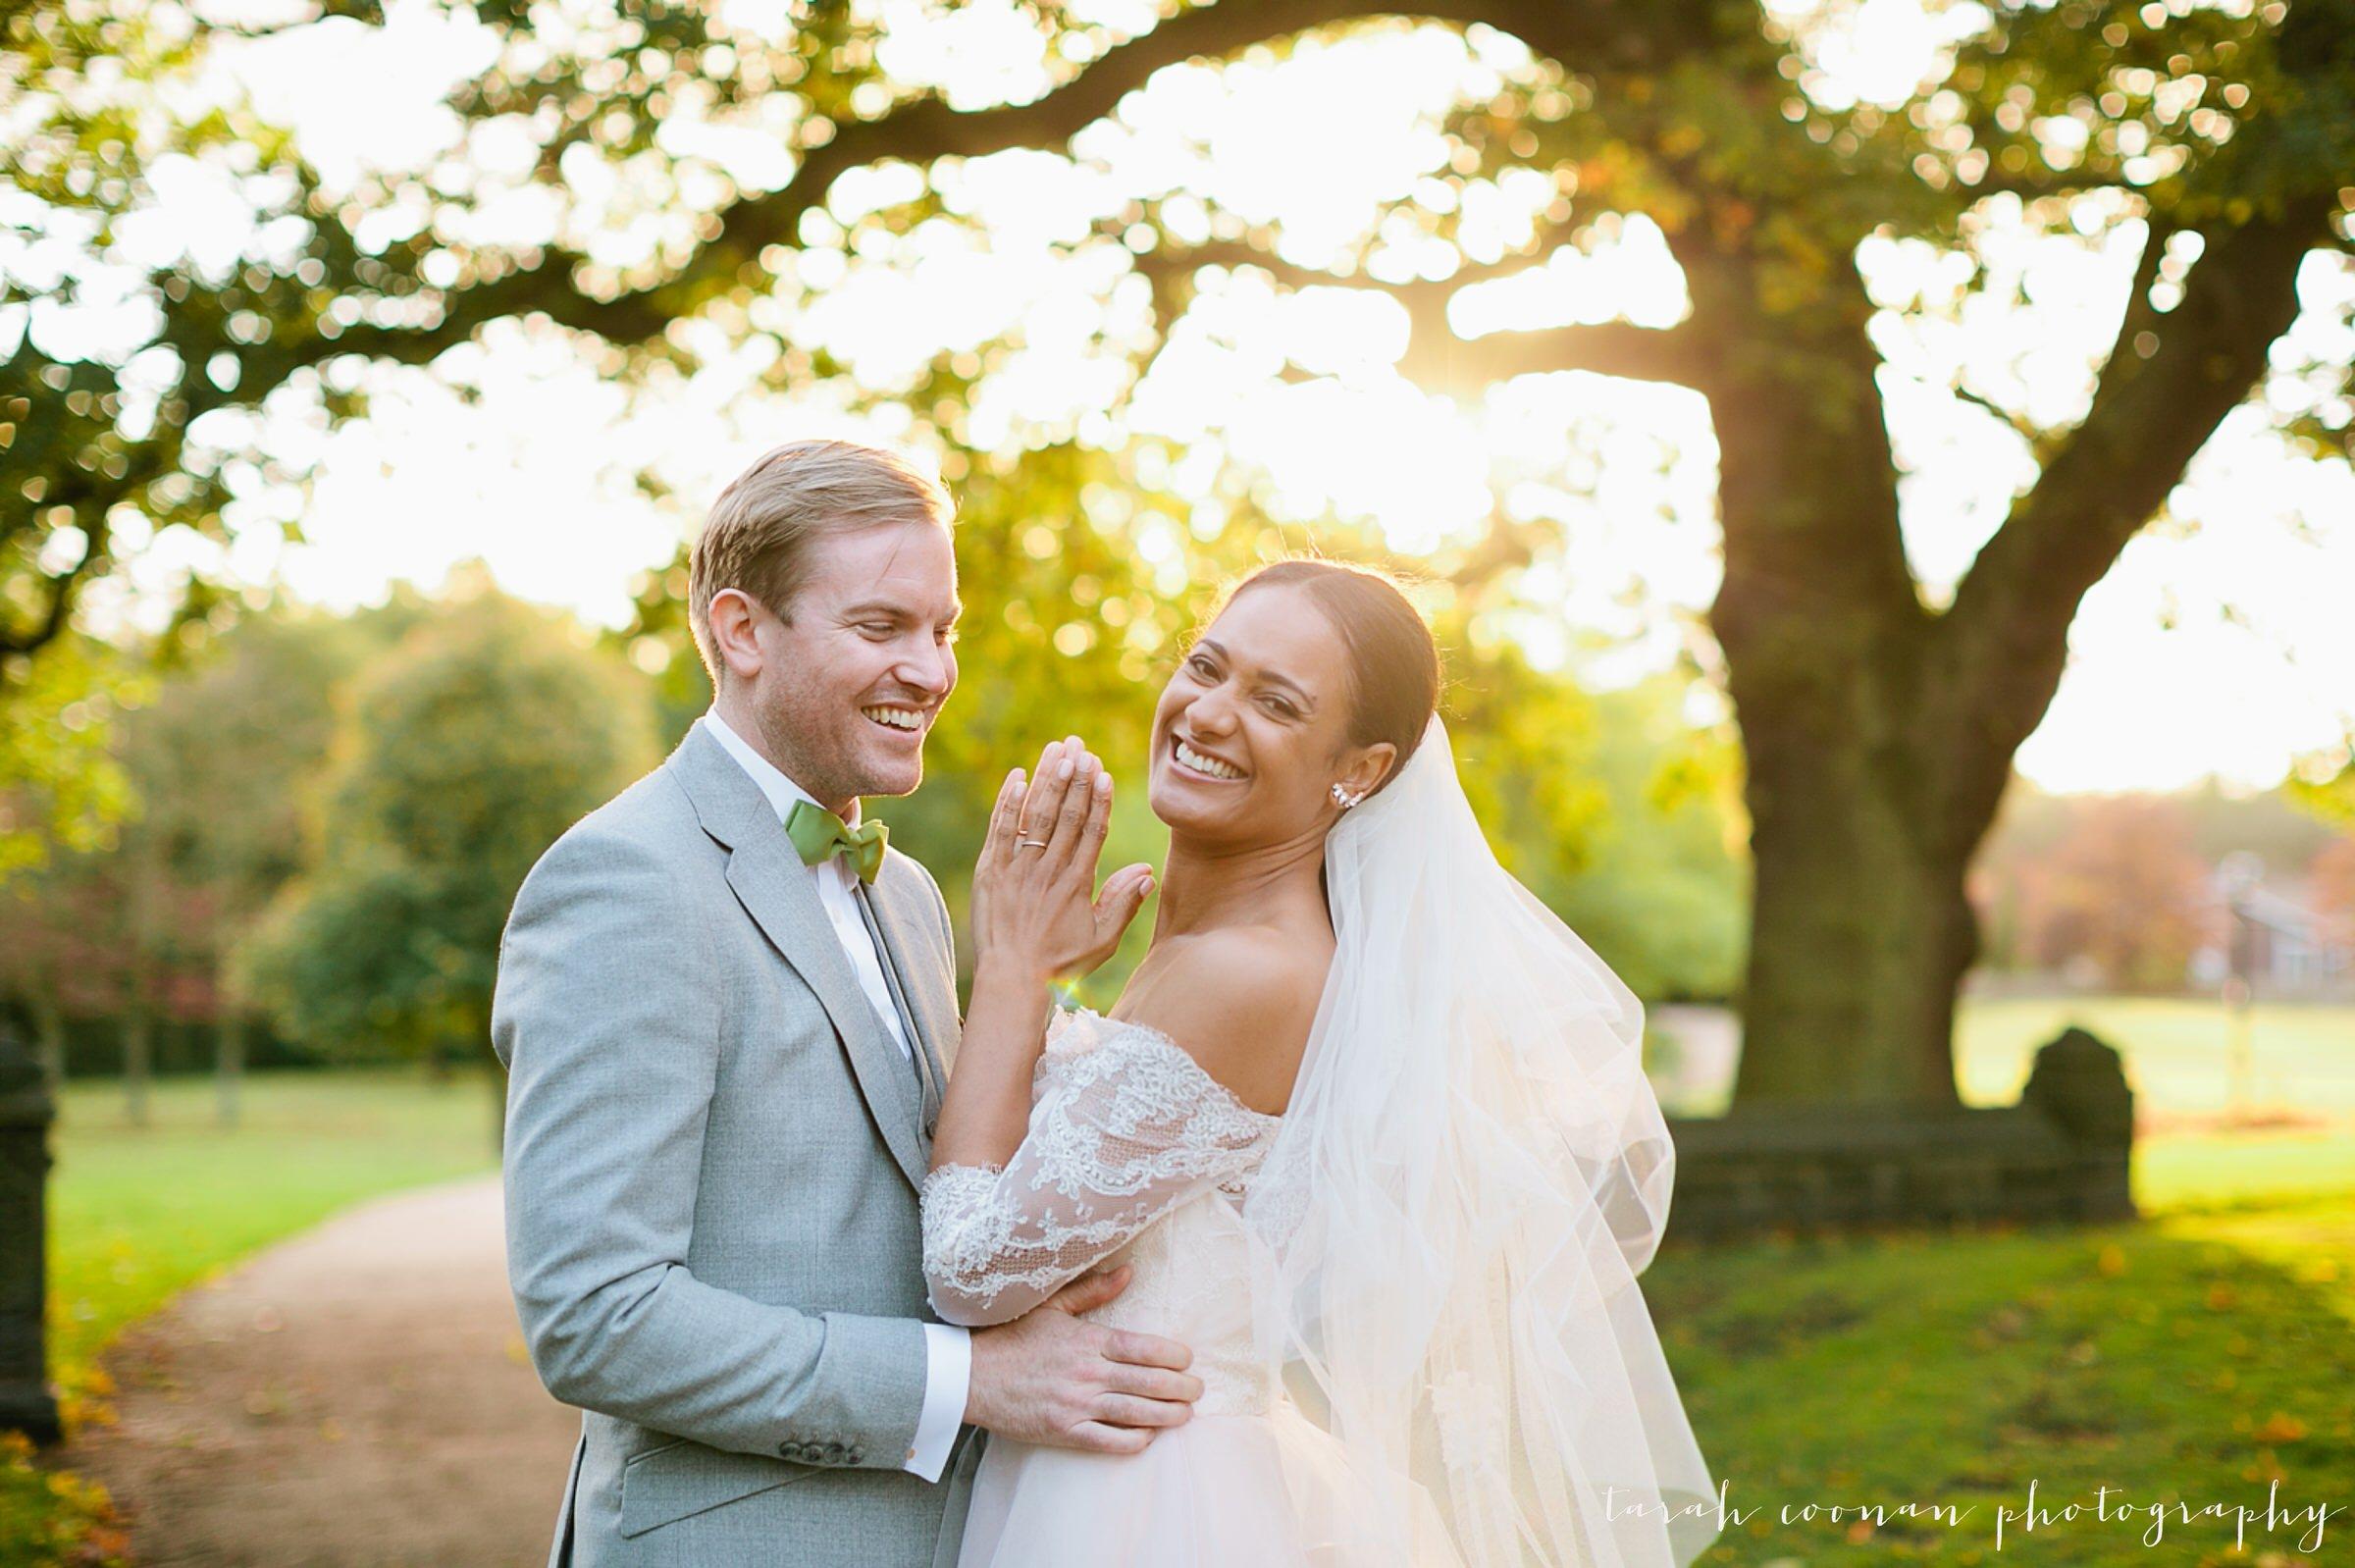 brighton-wedding-photographer75